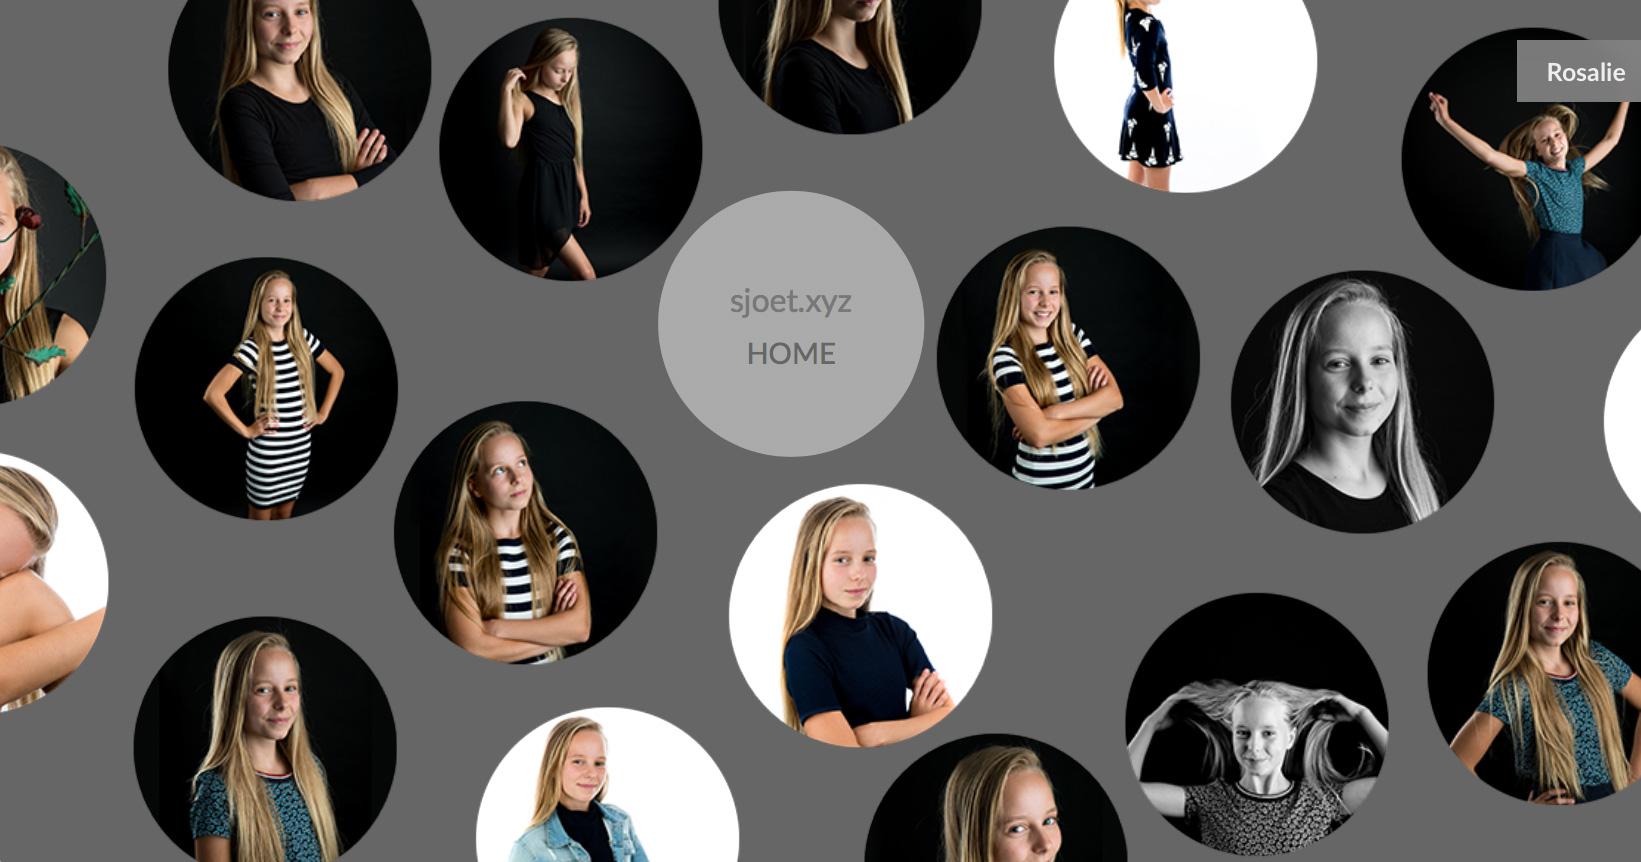 Rosalie van der Hoeven | Sjoet.xyz